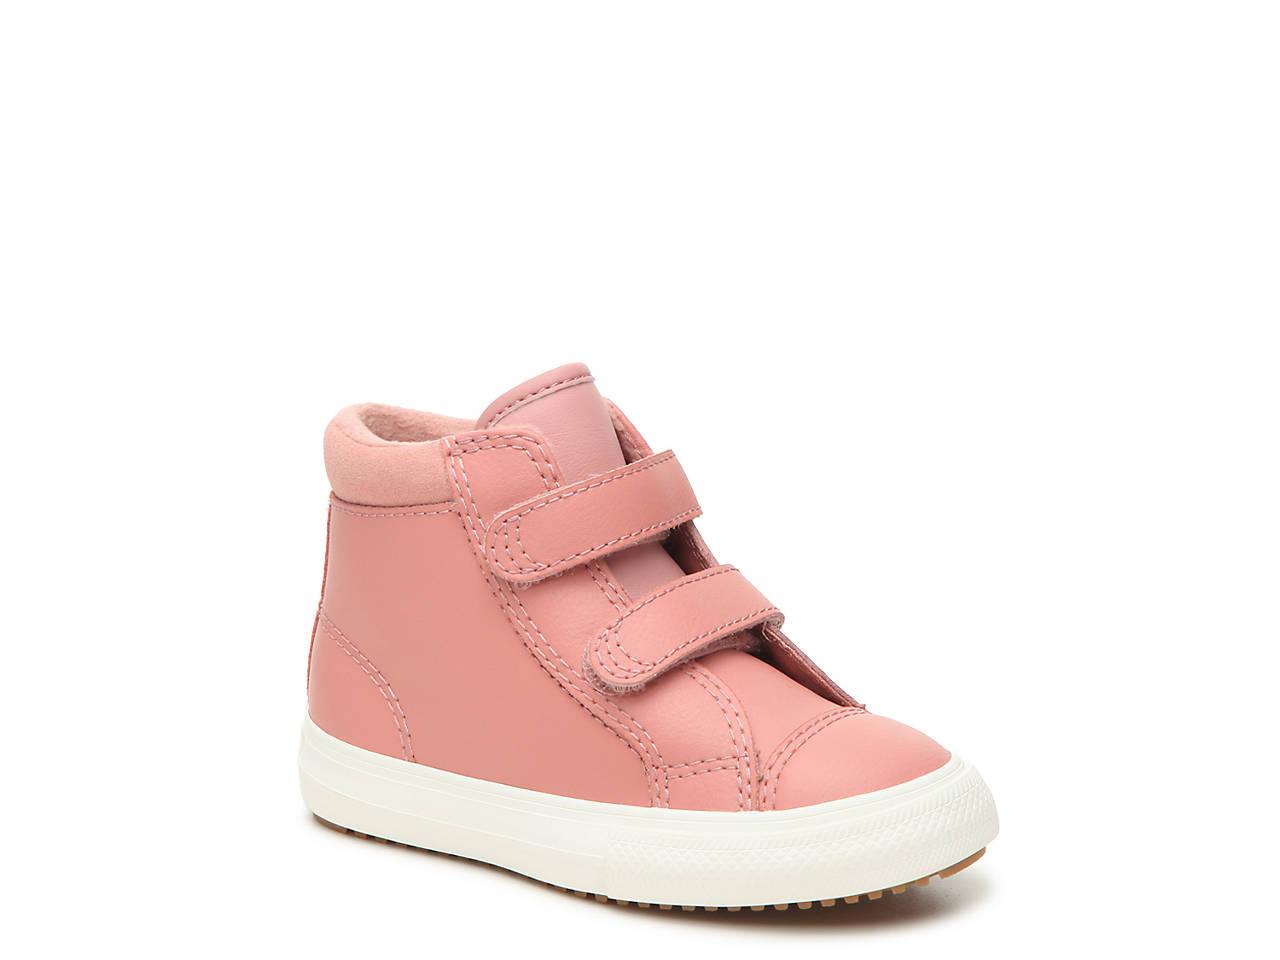 011433dce1 Chuck Taylor All Star 2V Infant & Toddler High-Top Sneaker